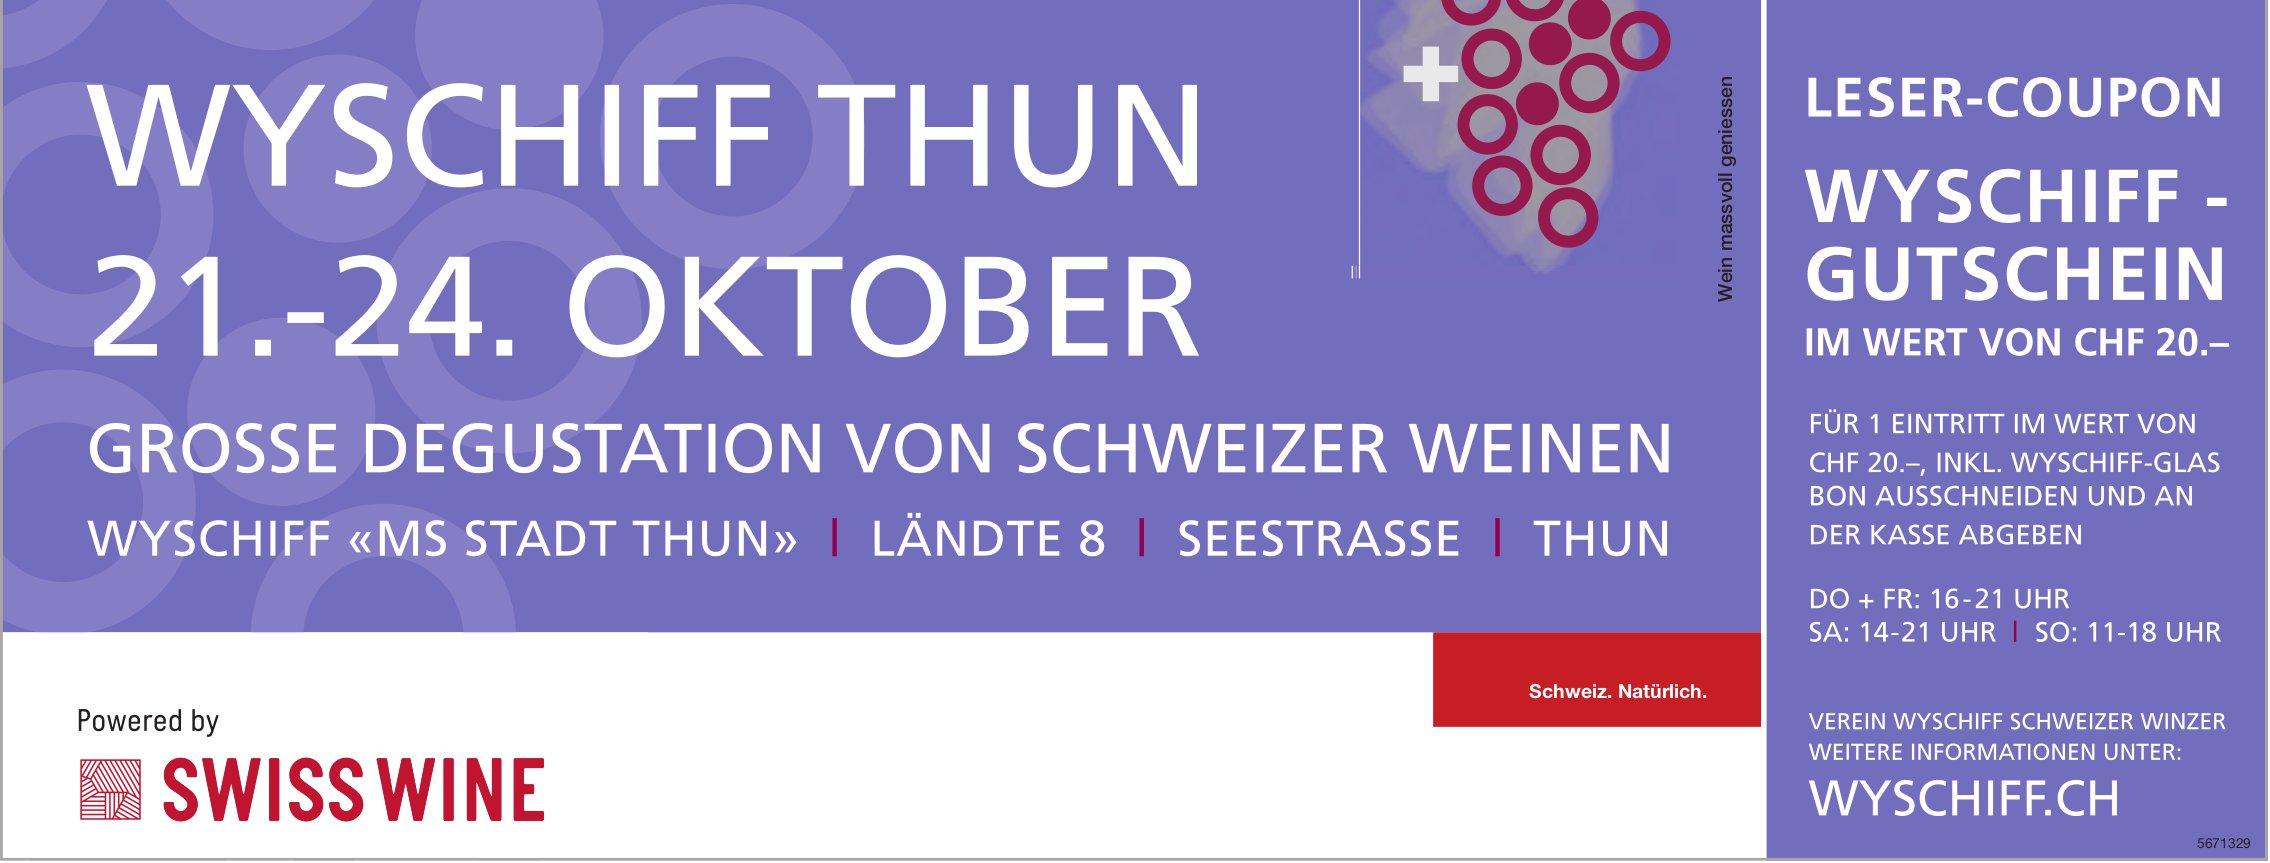 Wyschiff Thun, 21.-27. Oktober